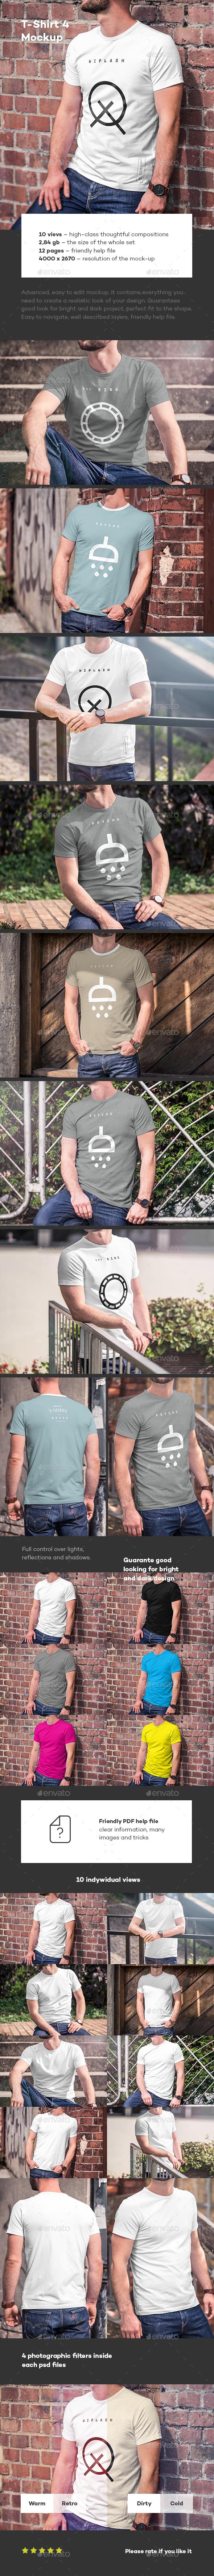 T-Shirt Mock-up 4